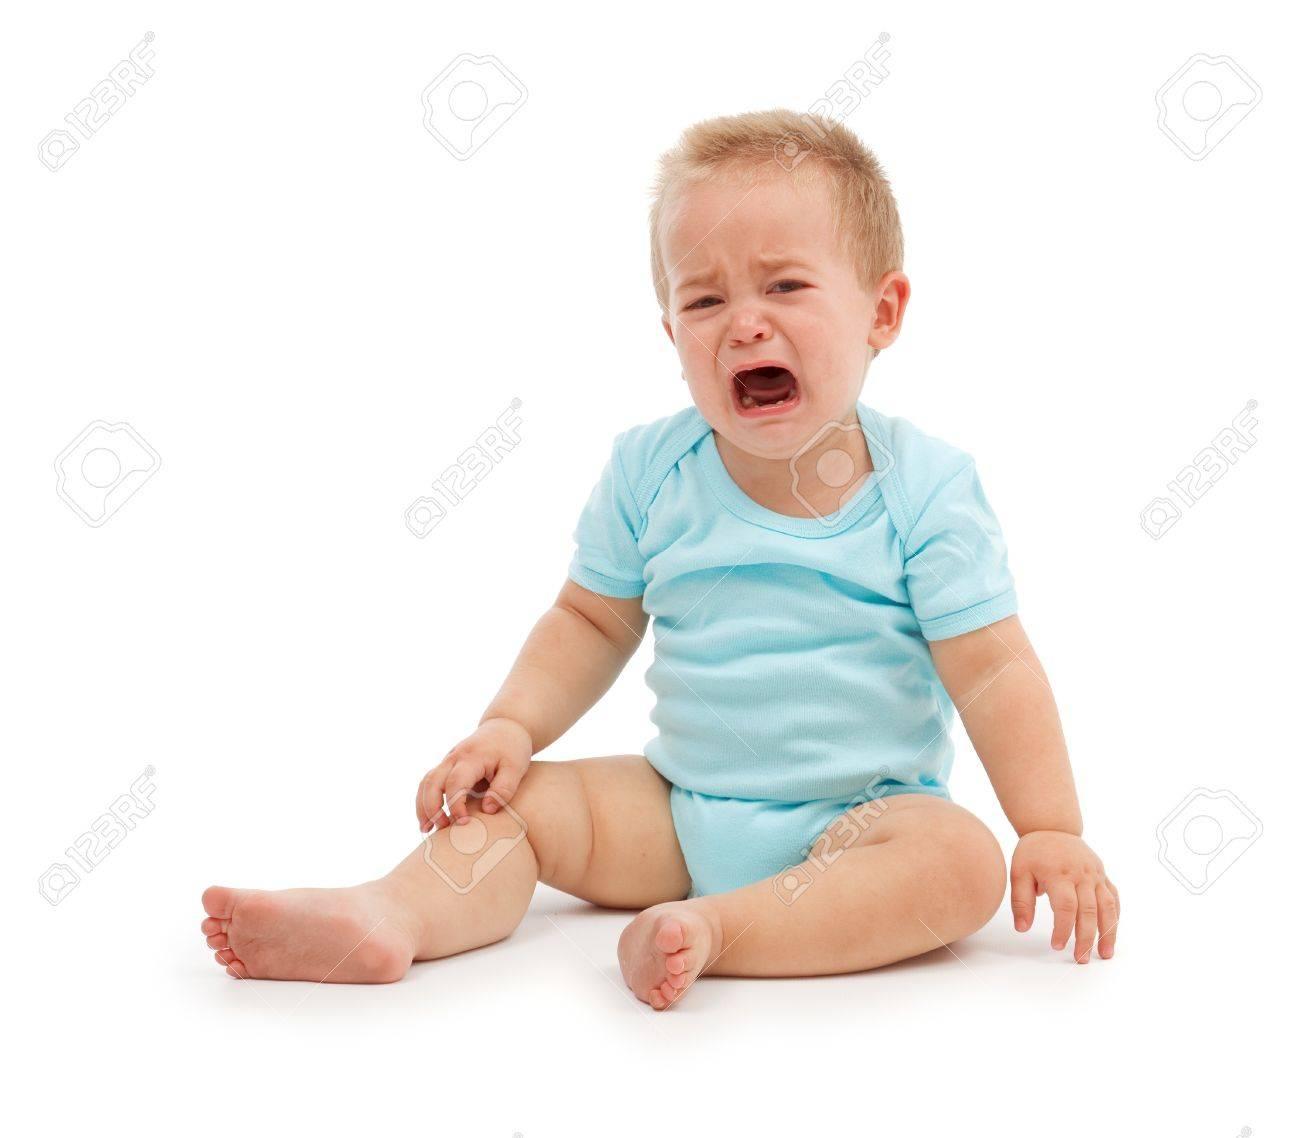 Sad baby boy sitting and crying Stock Photo - 7534174